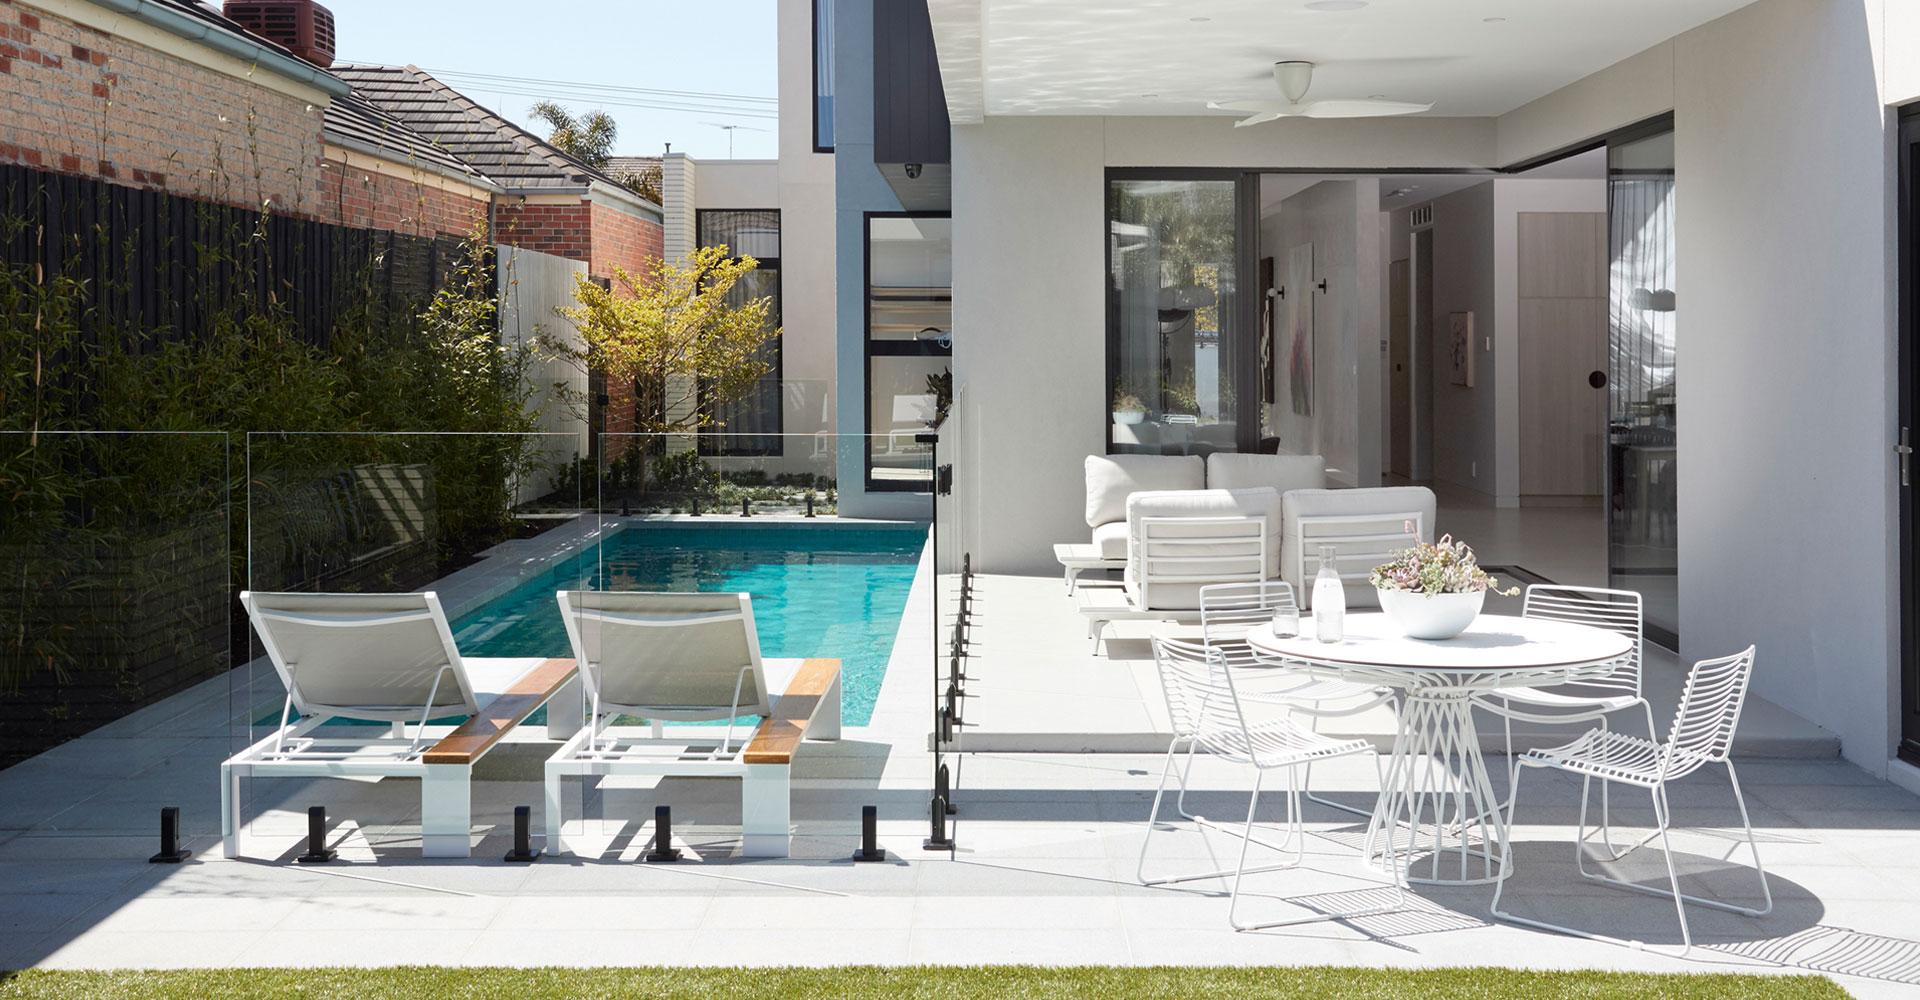 small area designer swimming pools